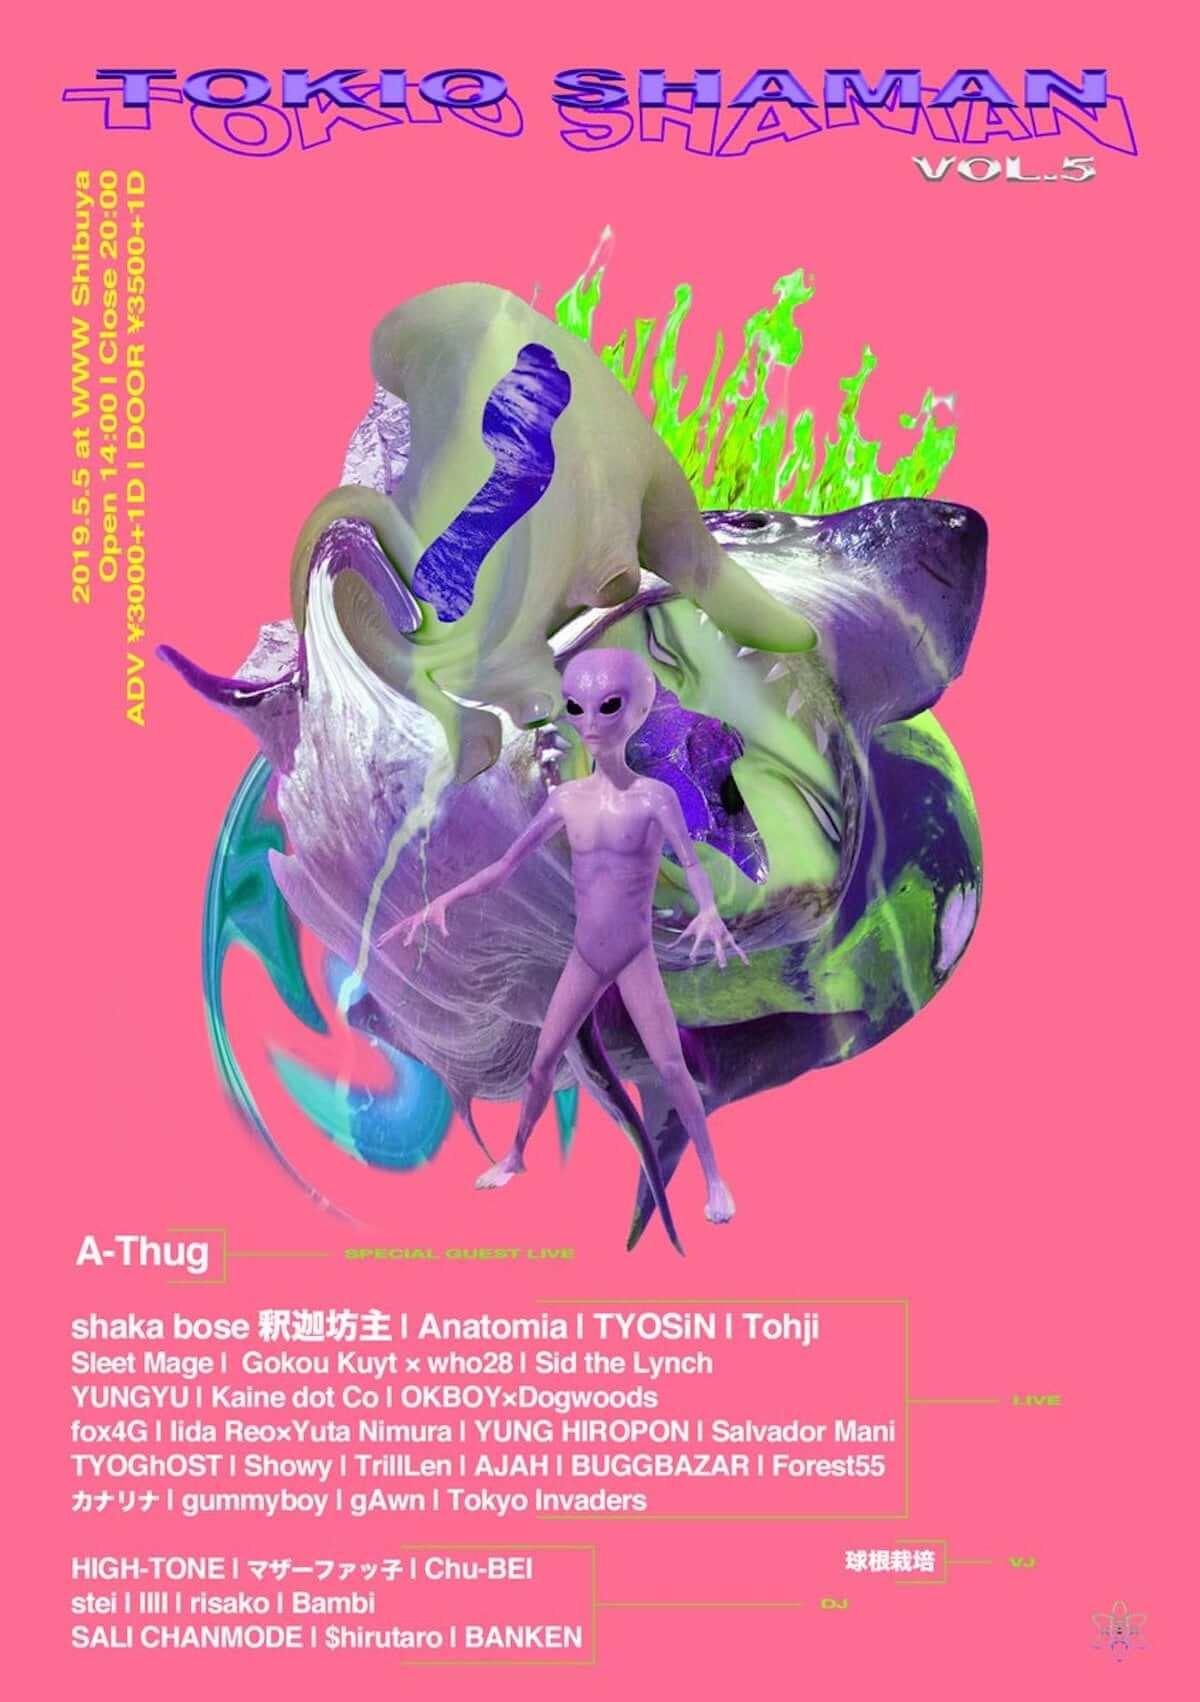 shaka bose 釈迦坊主による<TOKIO SHAMAN vol.5>がWWWで5月5日に開催|A-ThugやTohji、マザーファッ子らが登場 music190404-shaka-bose-tokyo-shaman-vol-5-1200x1702